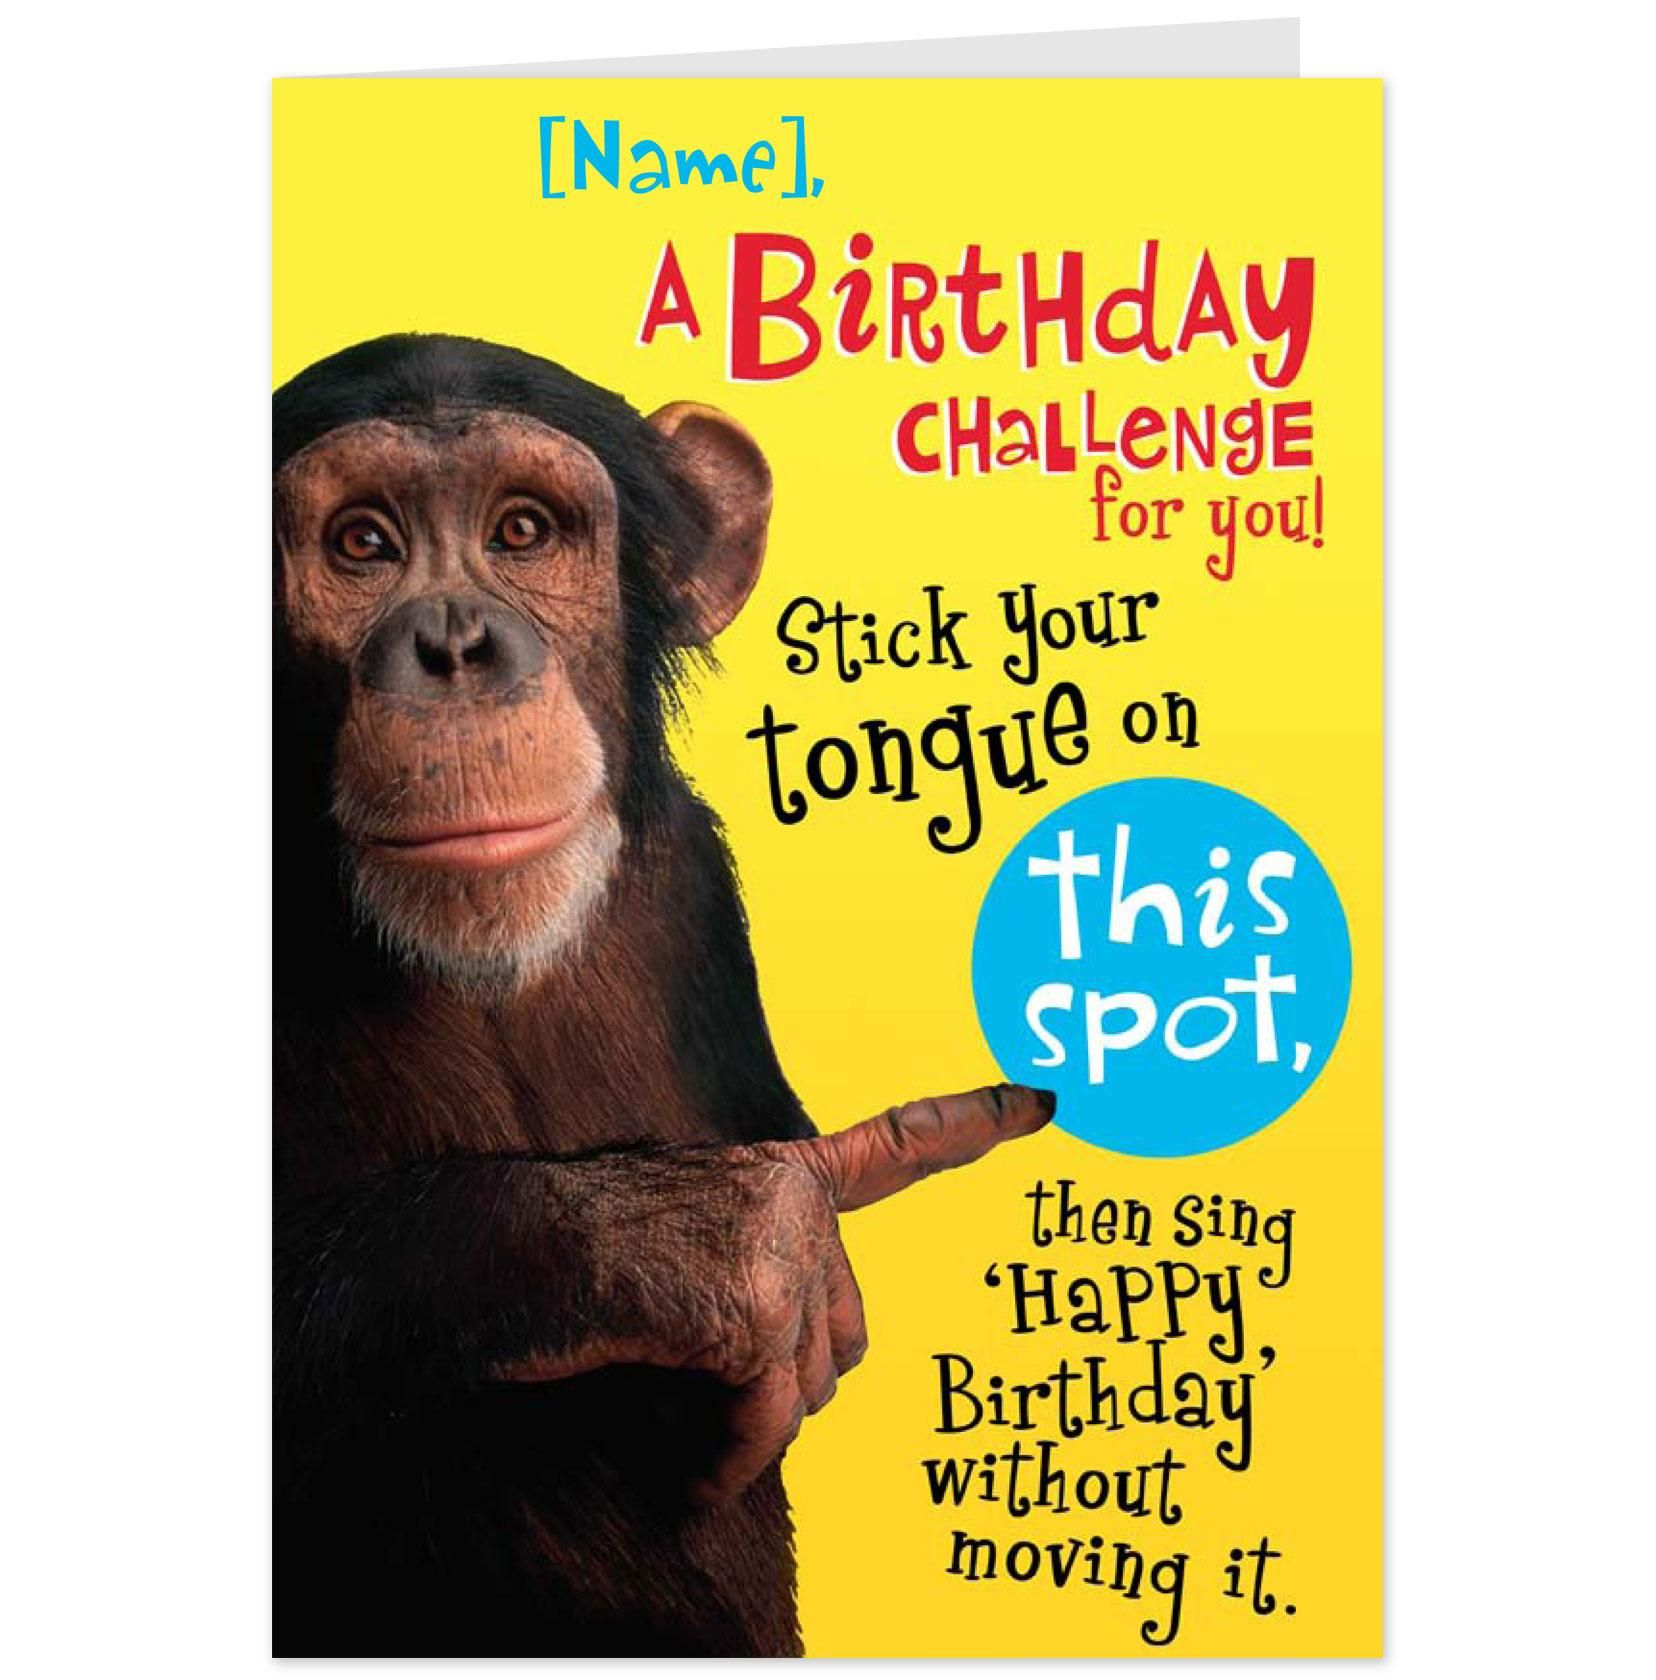 Funny Birthday Cards Funny birthday cards, Funny